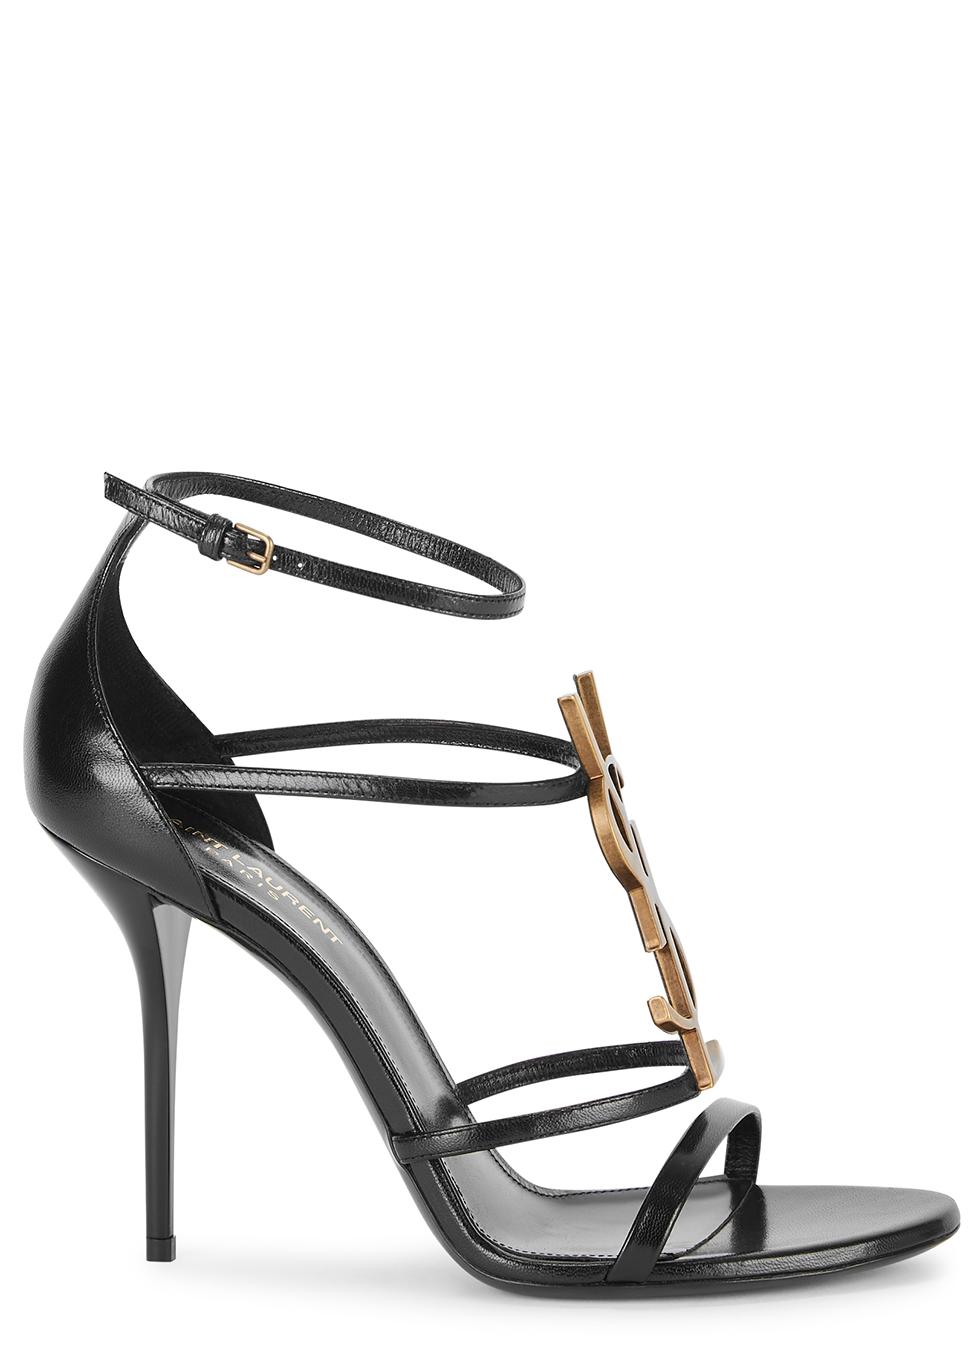 Cassandra 100 black leather sandals